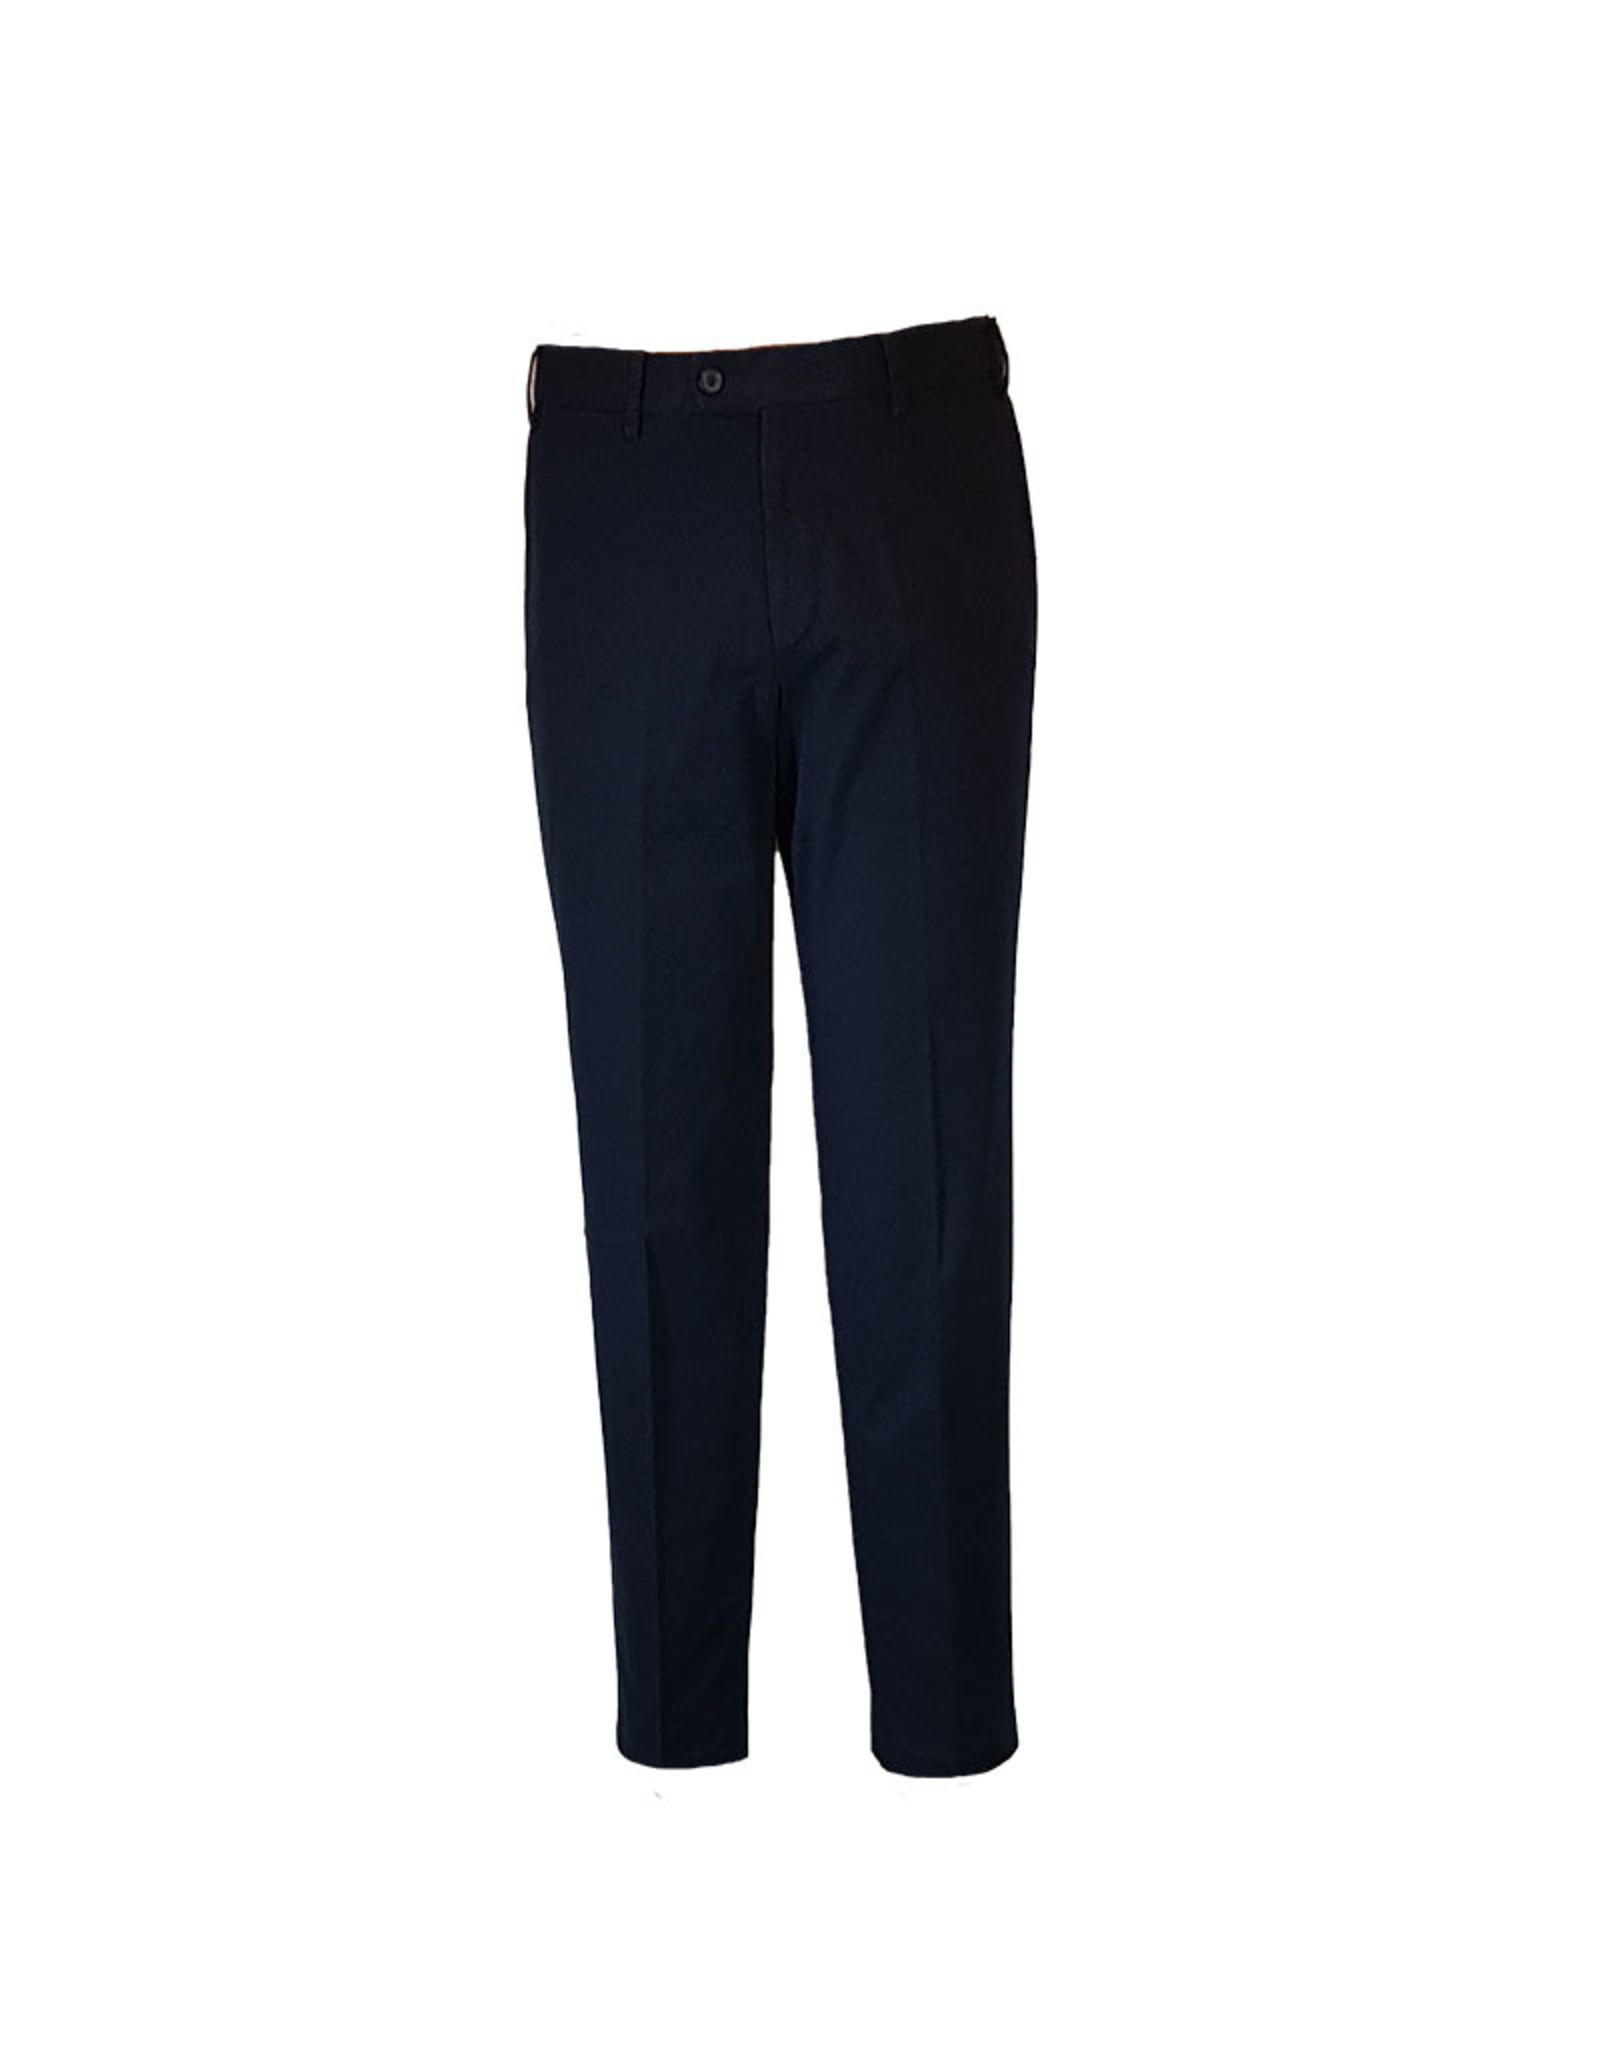 Hiltl Hiltl broek katoen blauw Parma 75452/40